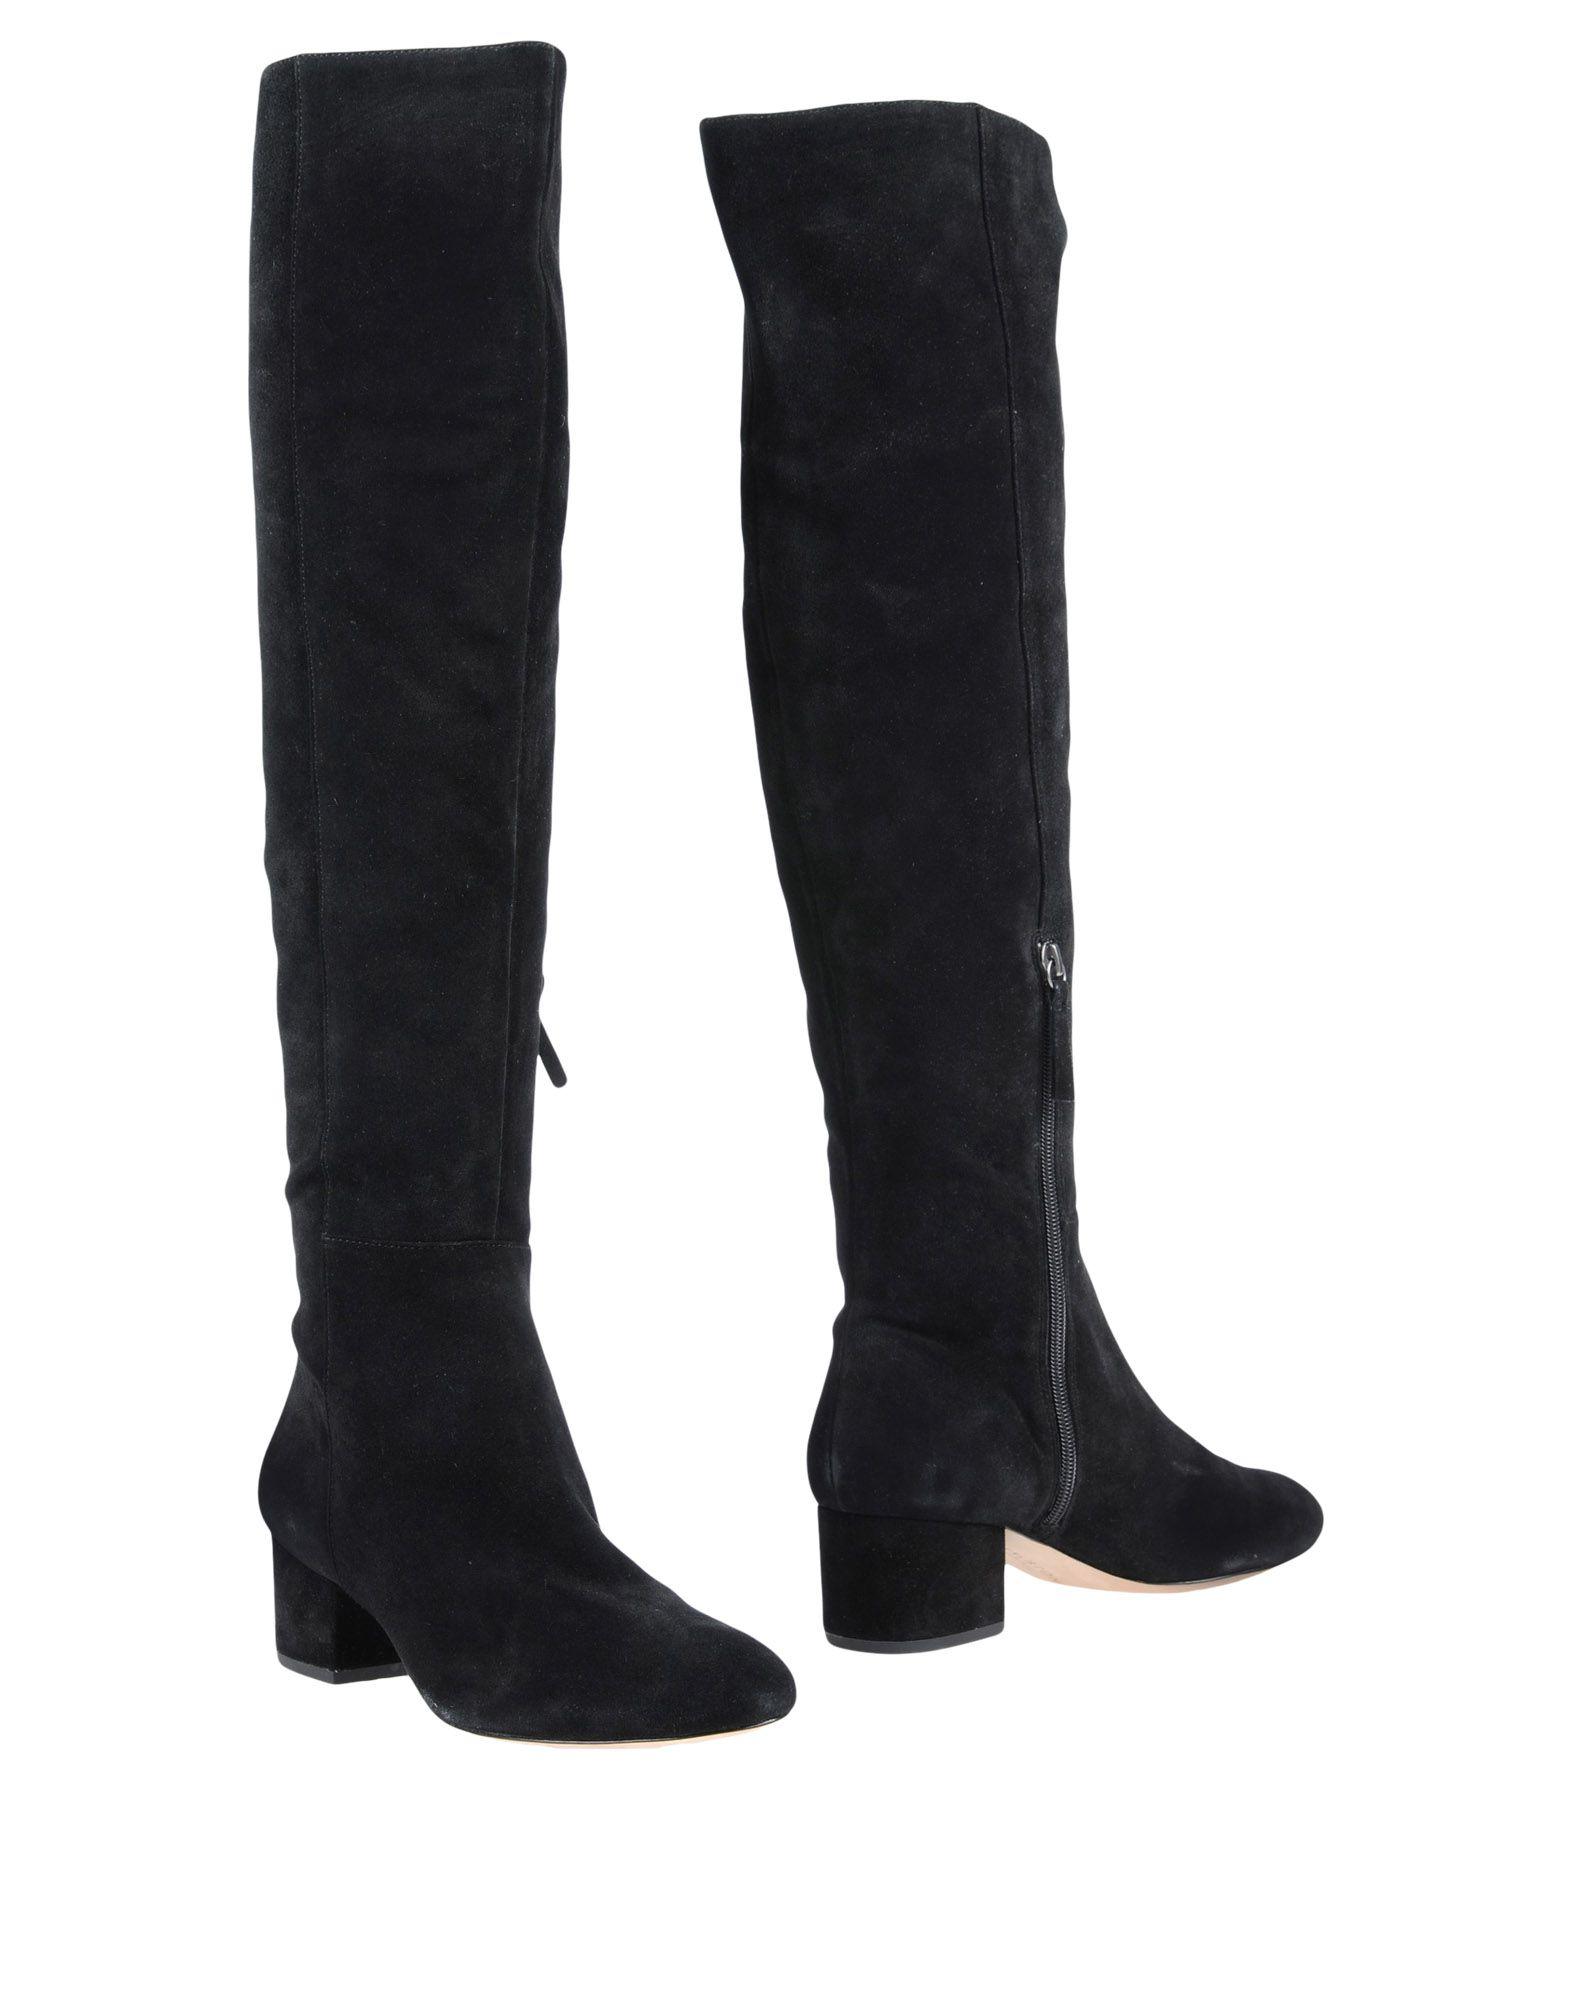 Halston Halston Halston Heritage Boots - Women Halston Heritage Boots online on  United Kingdom - 11440420AW a32c3e